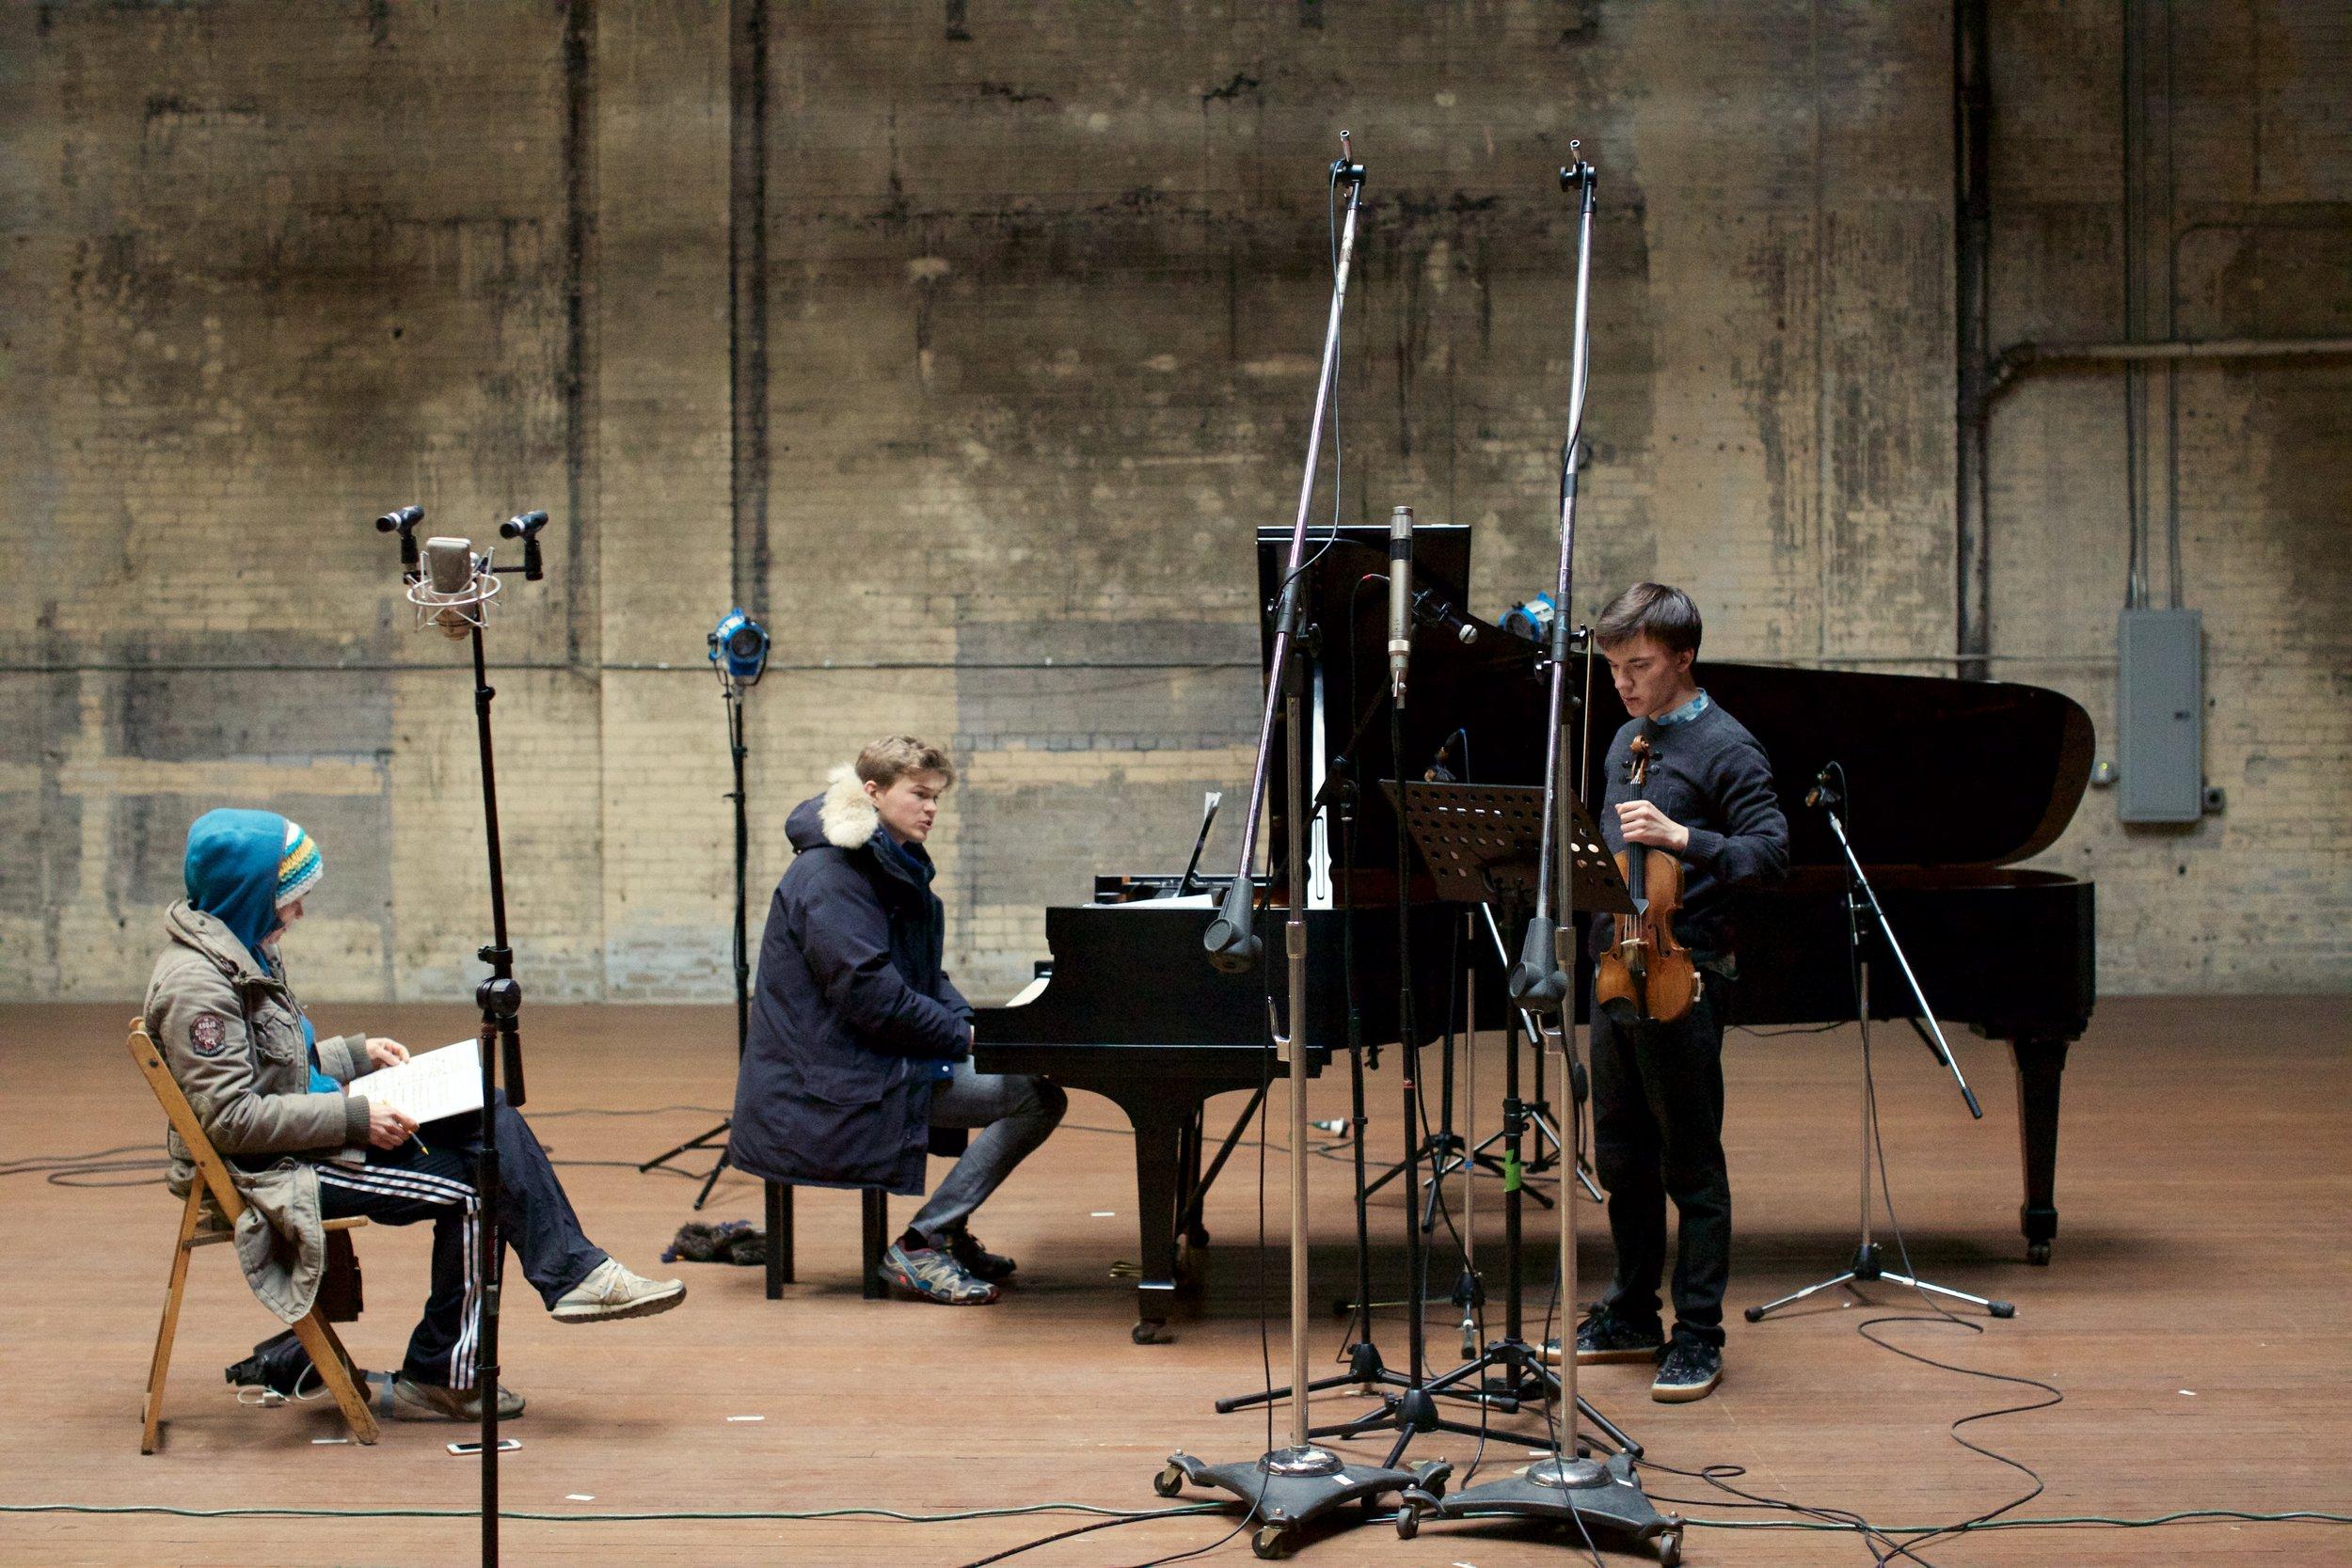 Caroline siegers, Ivan moshchuk, and Yury revich in studio. photo - stewart french